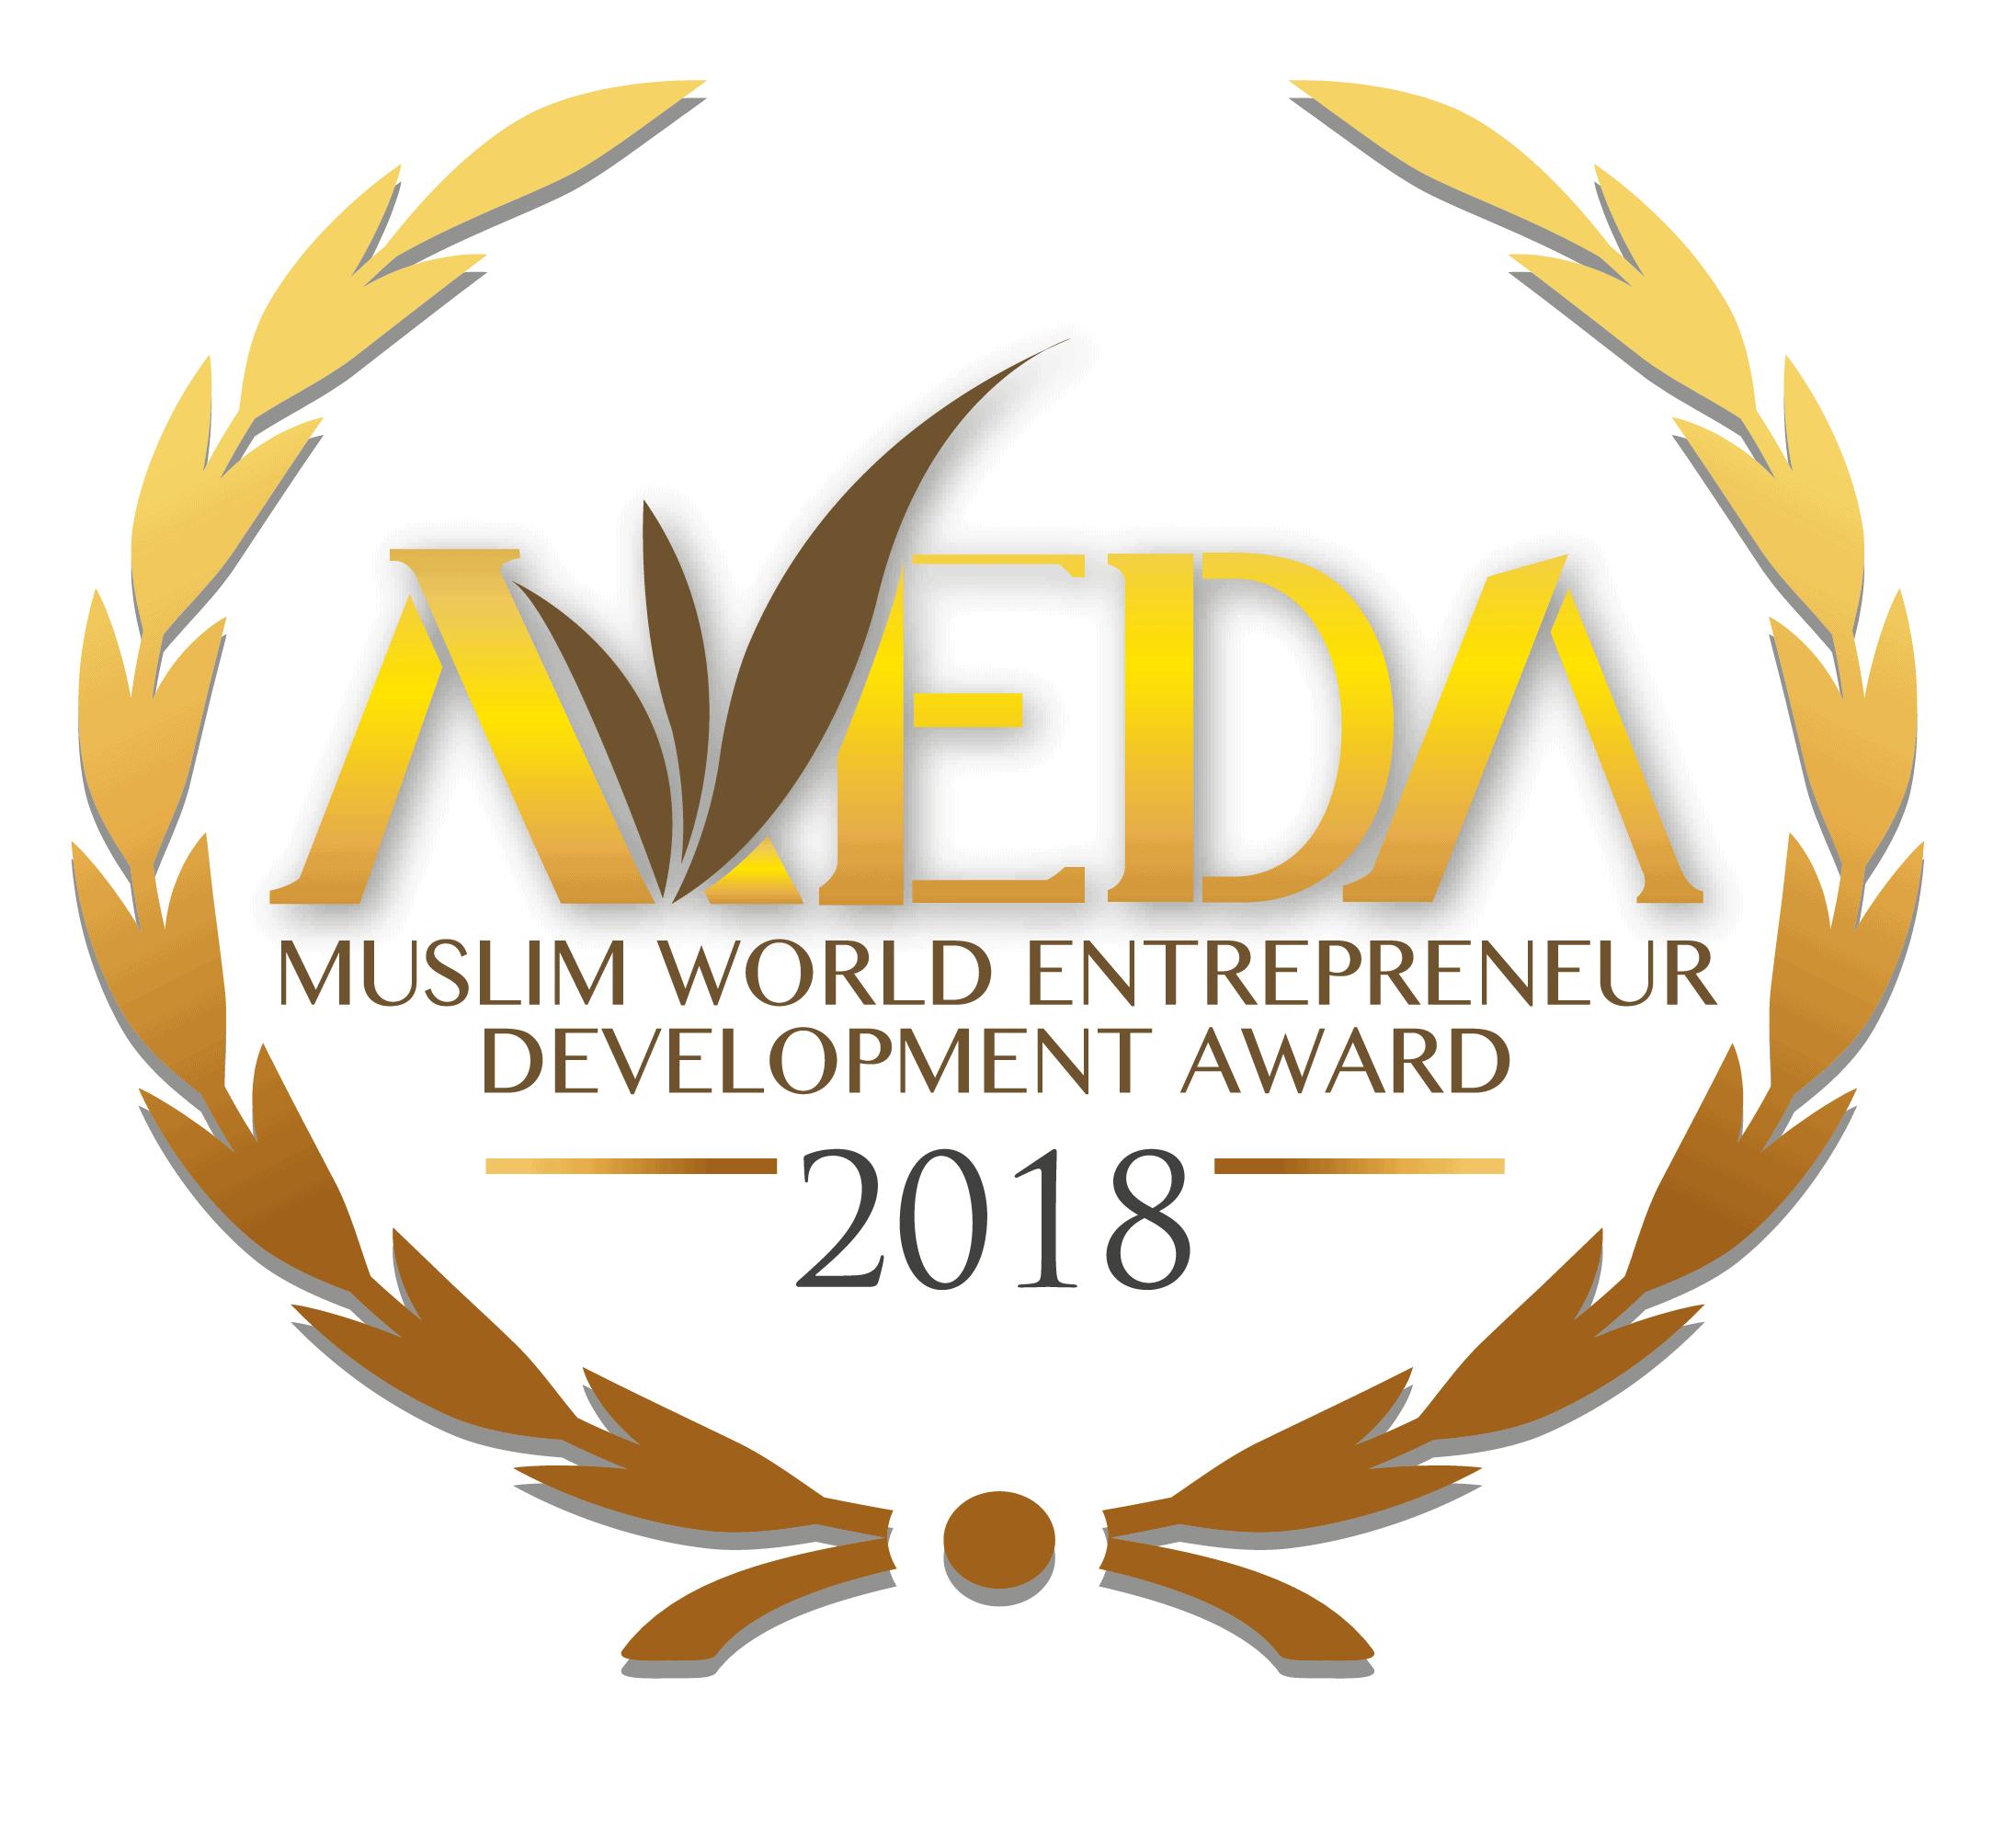 Muslim World Entrepreneur Development Award (MWEDA) 2018